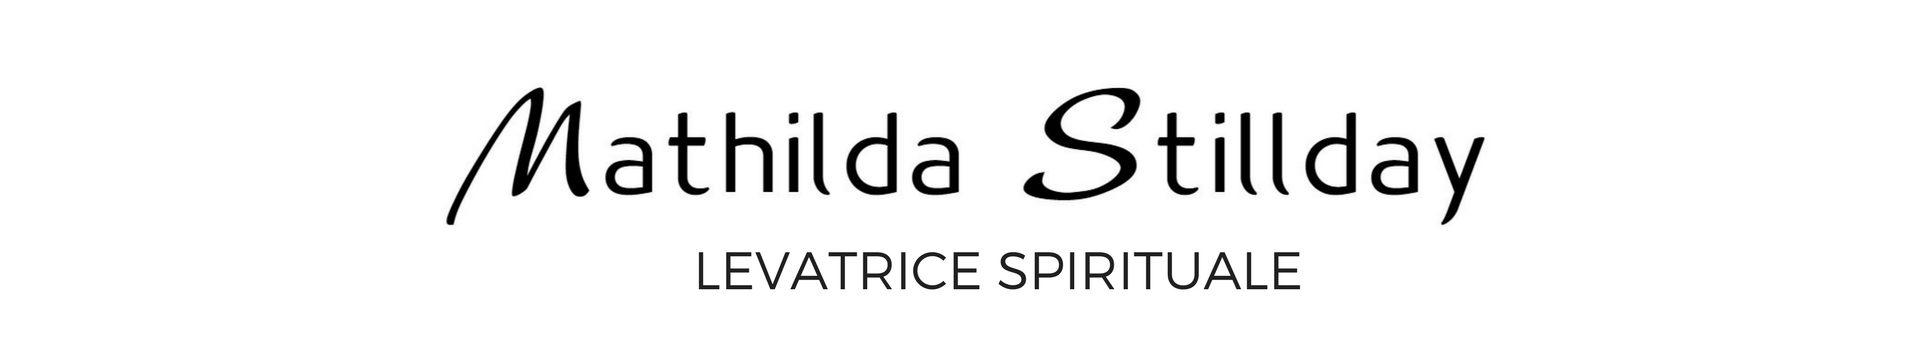 Mathilda Stillday